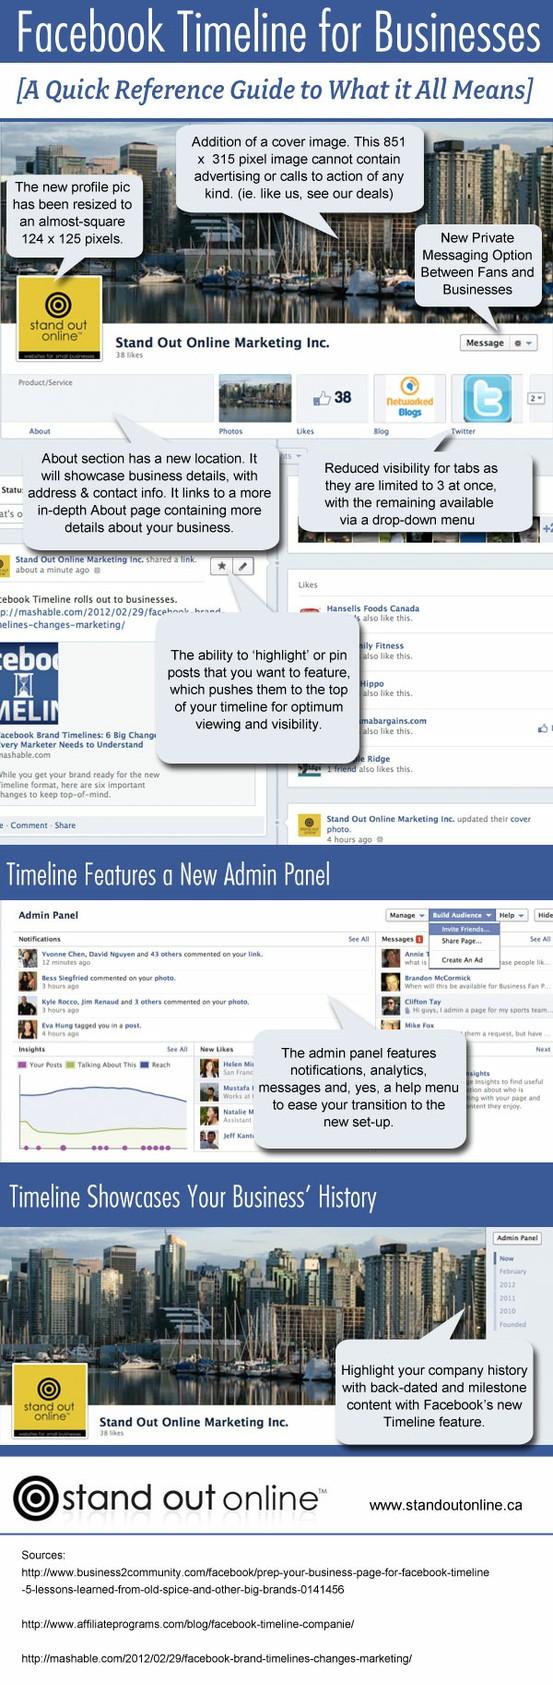 Ghid Facebook Timeline pentru branduri